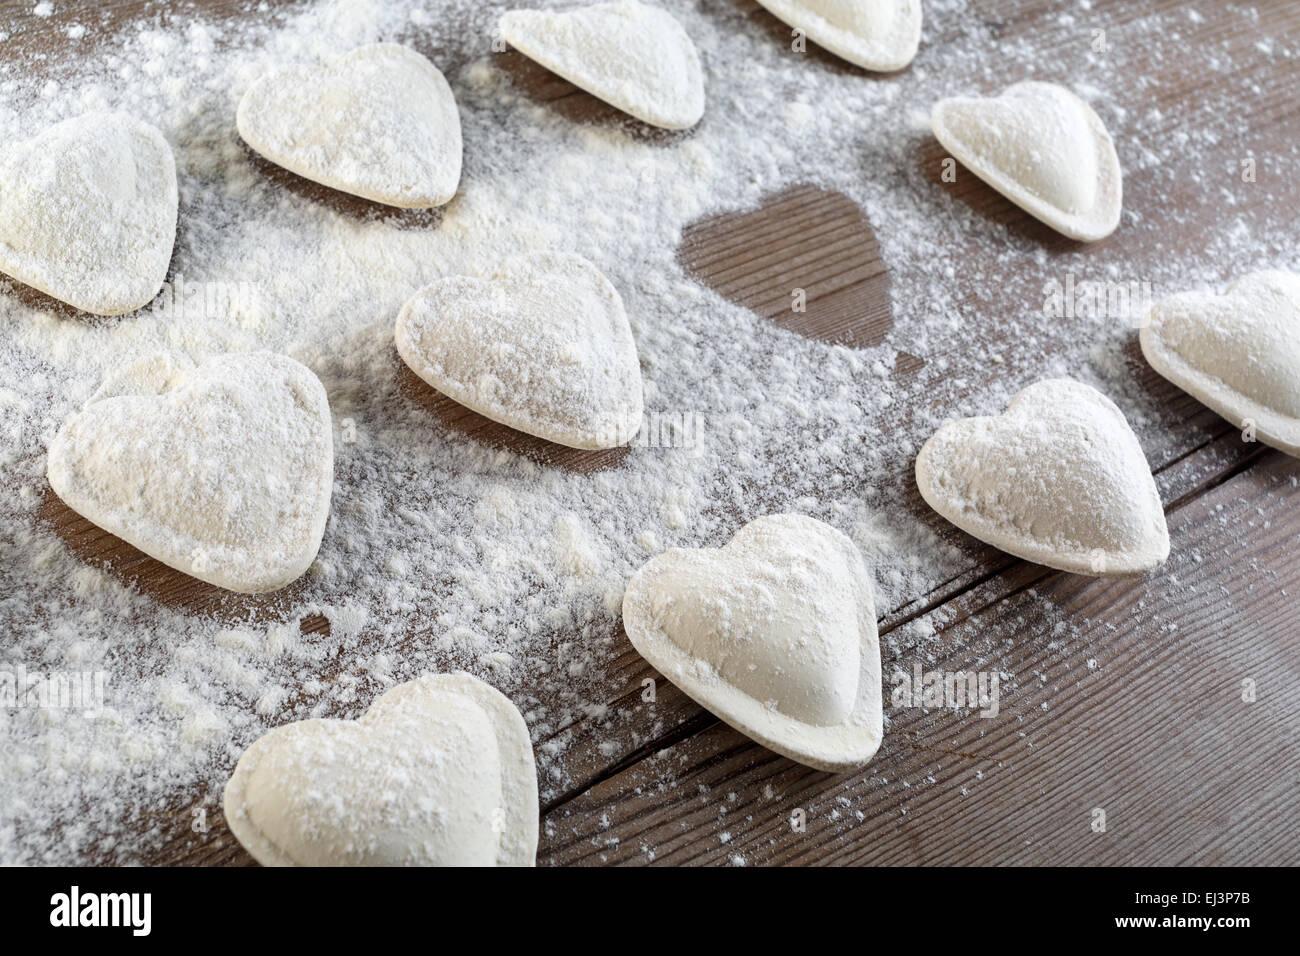 Cooking ravioli. Raw dumplings in the form of hearts sprinkled flour ...